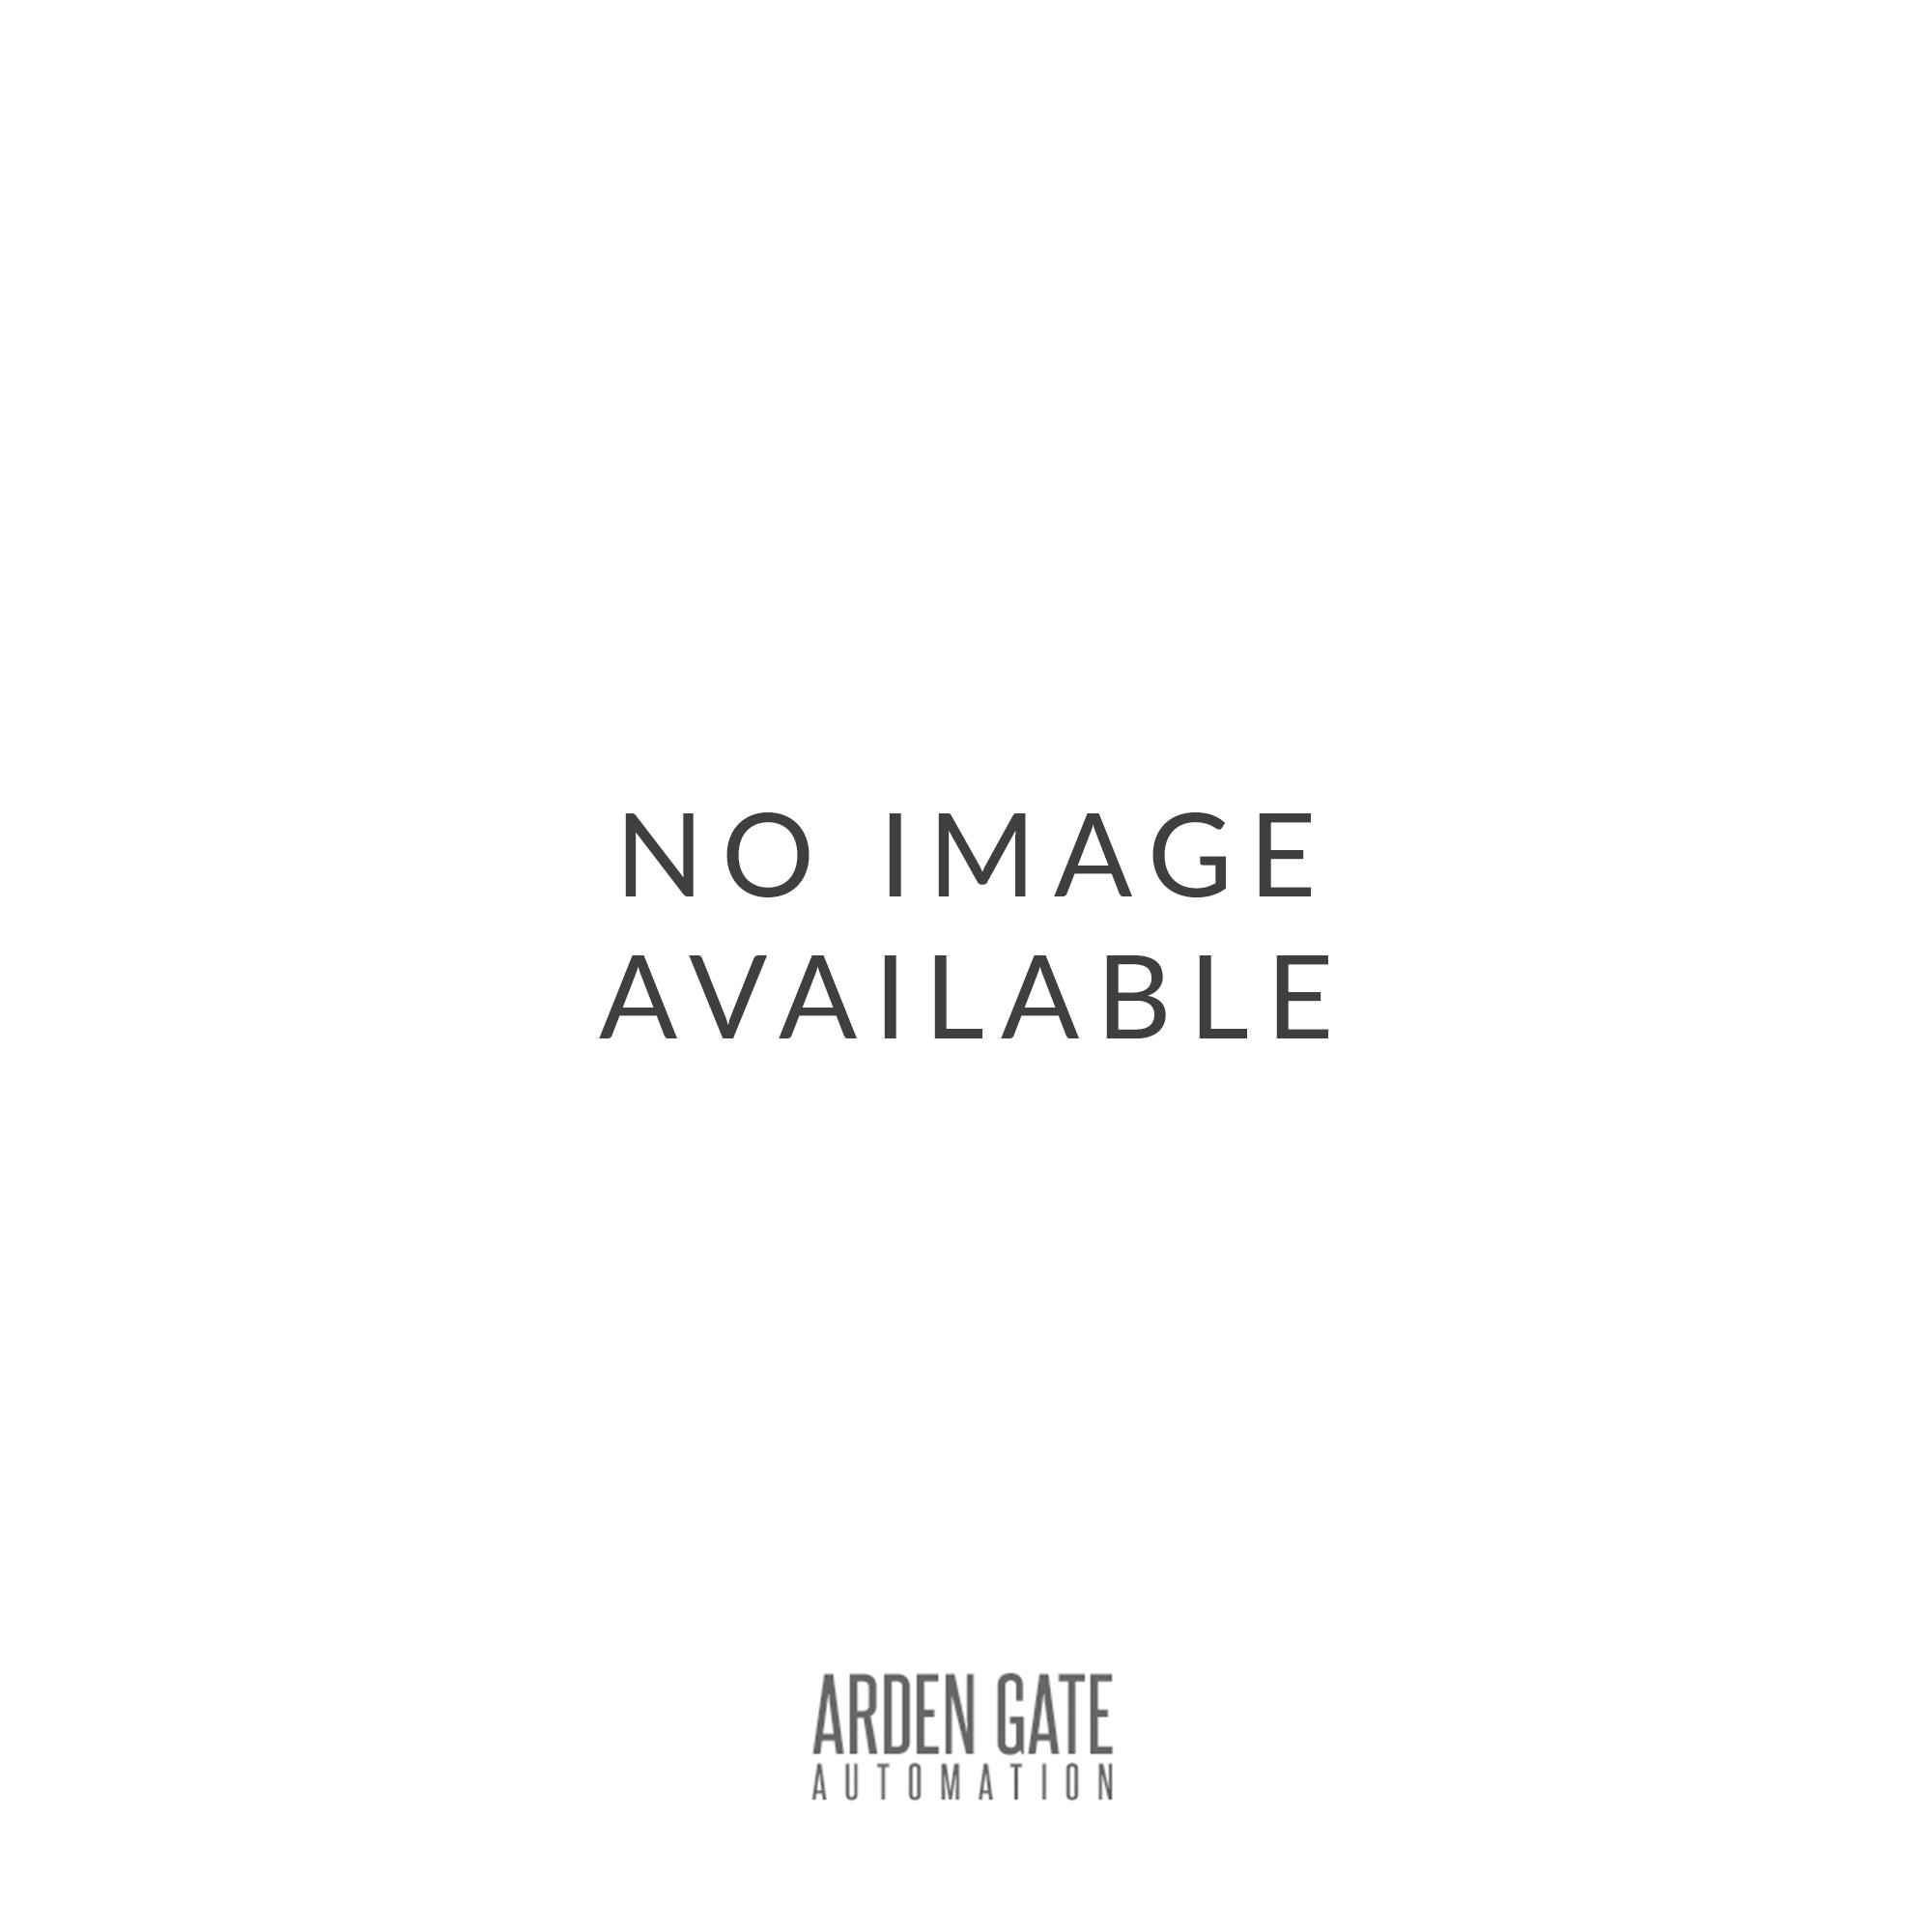 NICE XMETRO2124KCE - X-FABKIT 2124/ X-METRO KIT 2124 - Double operator kit